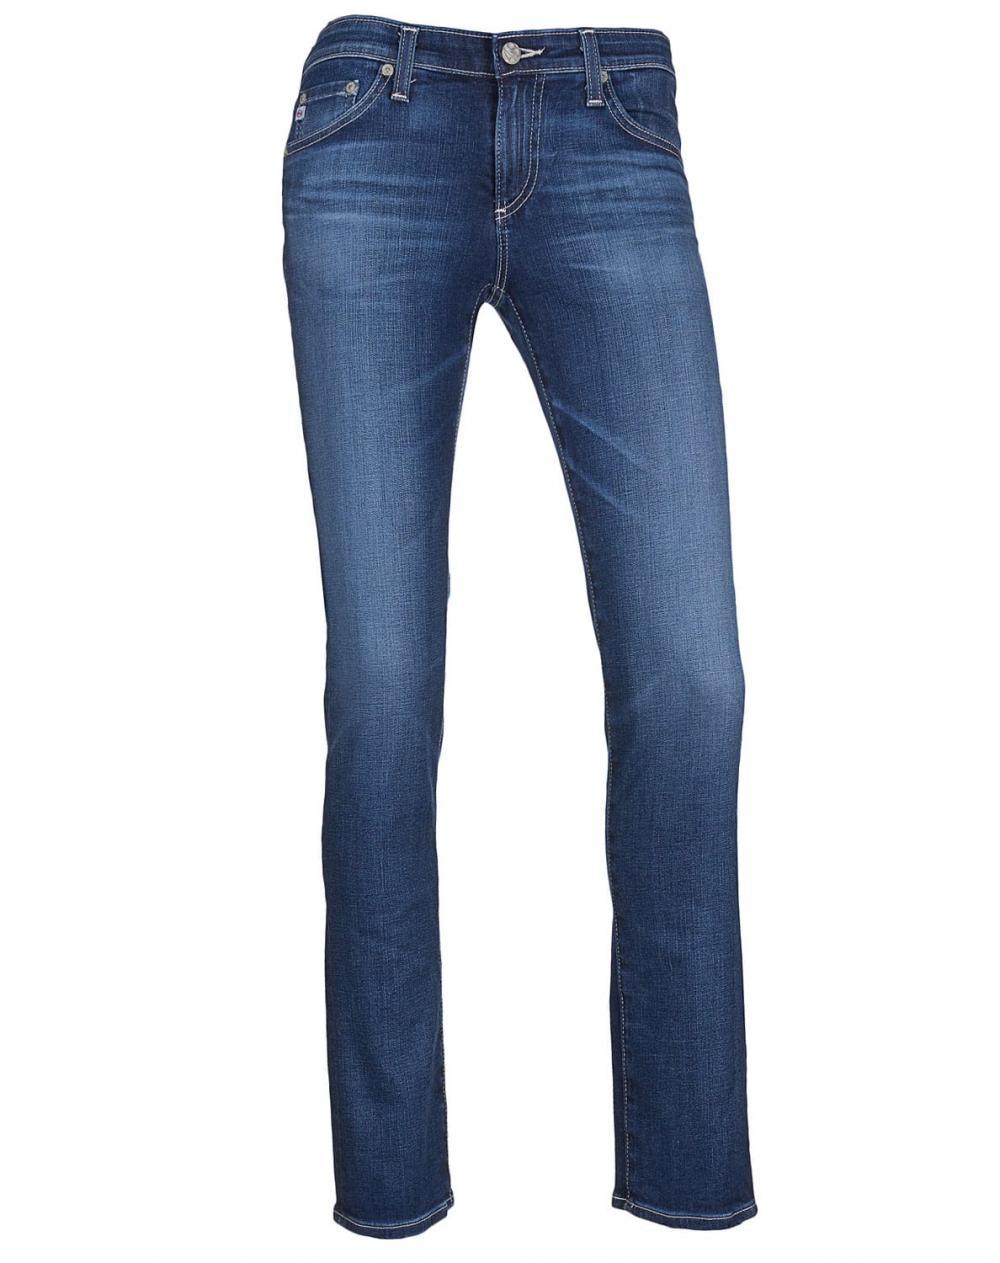 Jeans Stilt 11Y